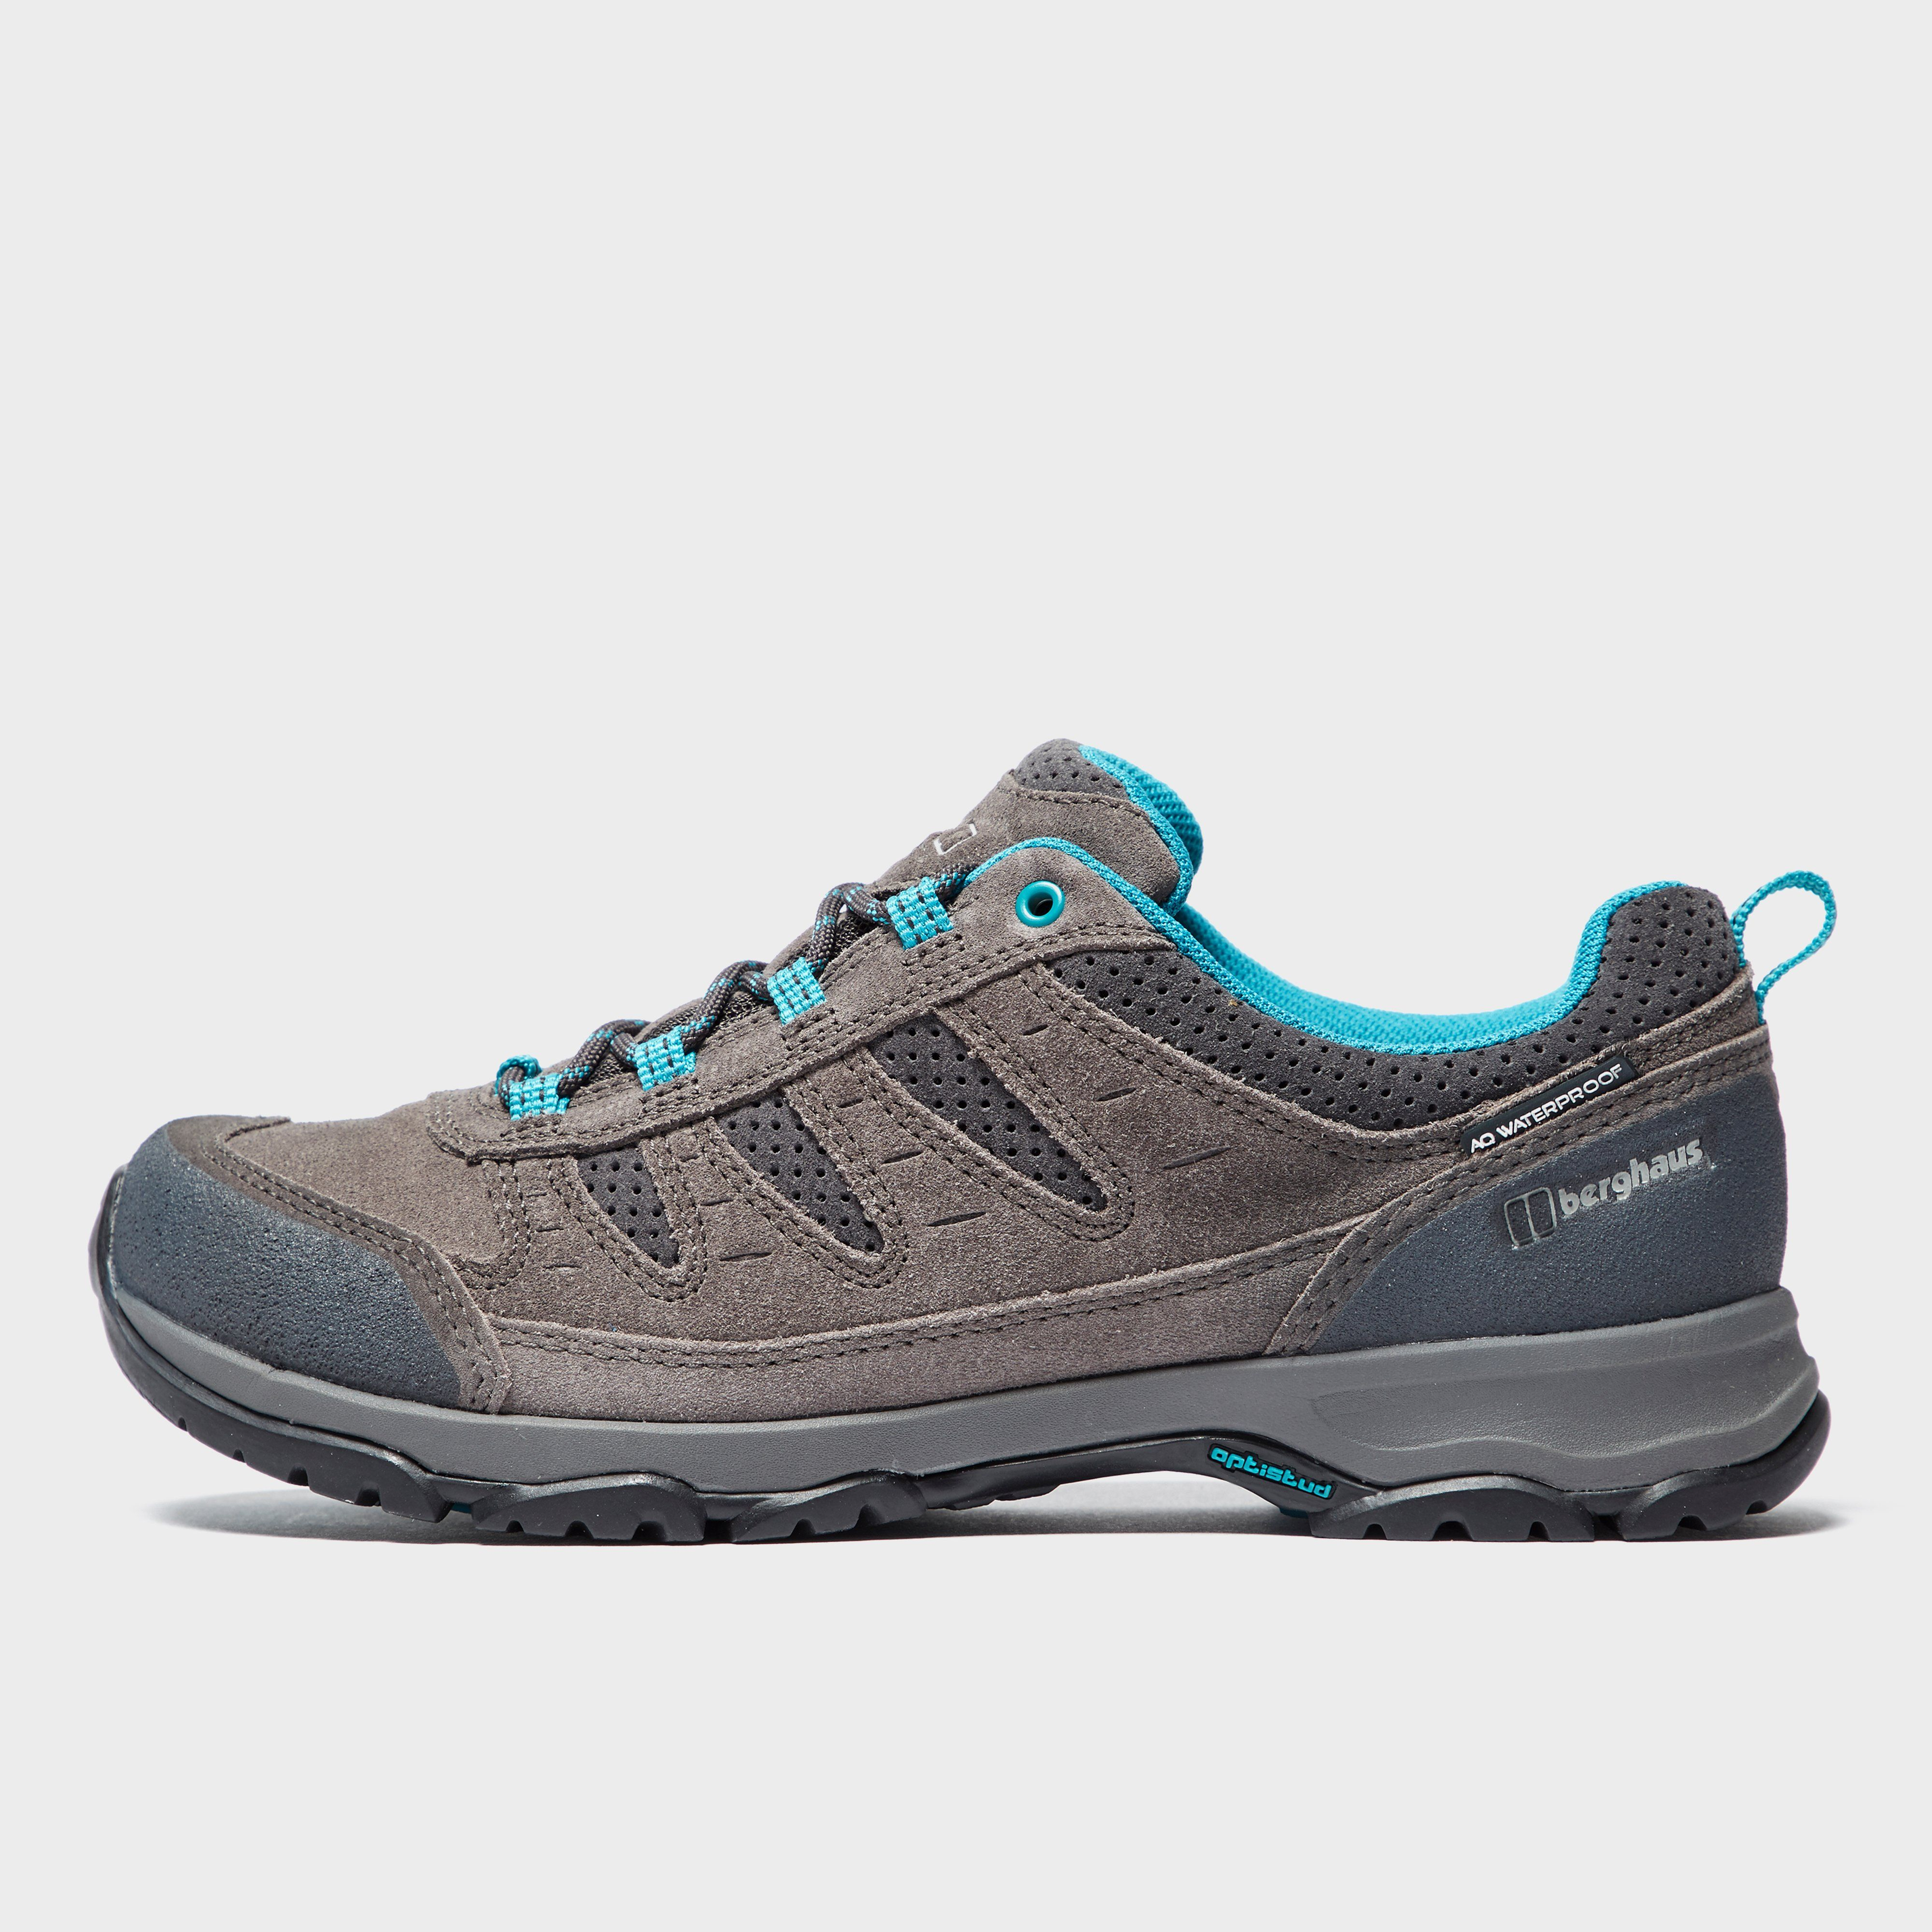 BERGHAUS Women's Explorer Active AQ Shoes